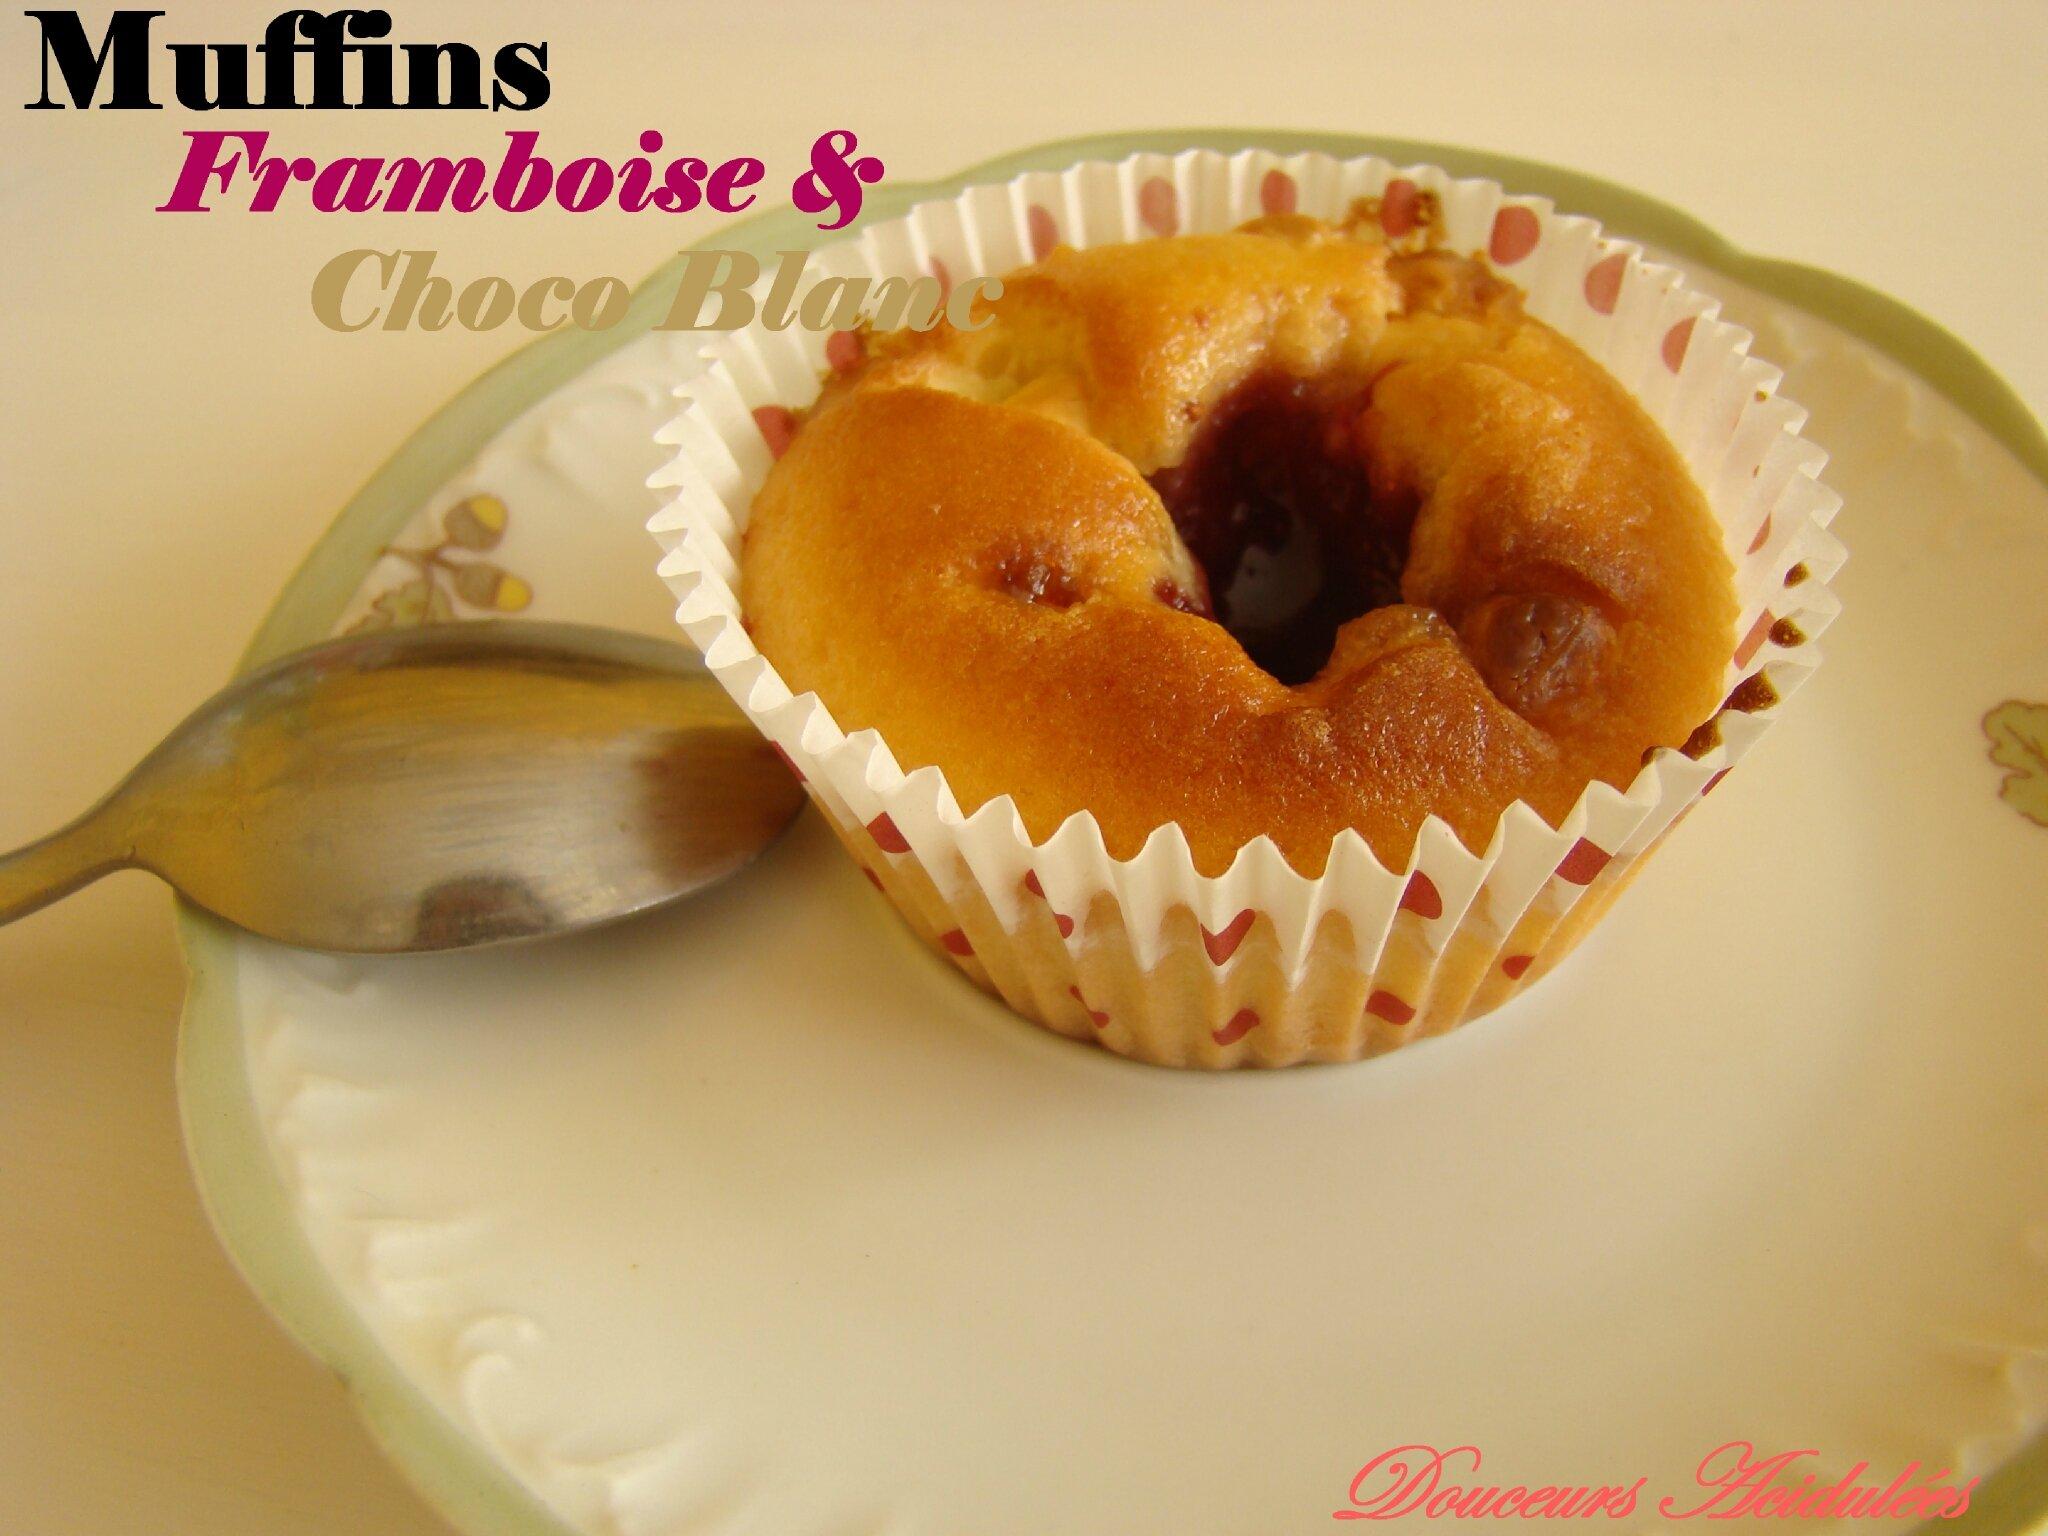 Muffins Framboise & Choco Blanc